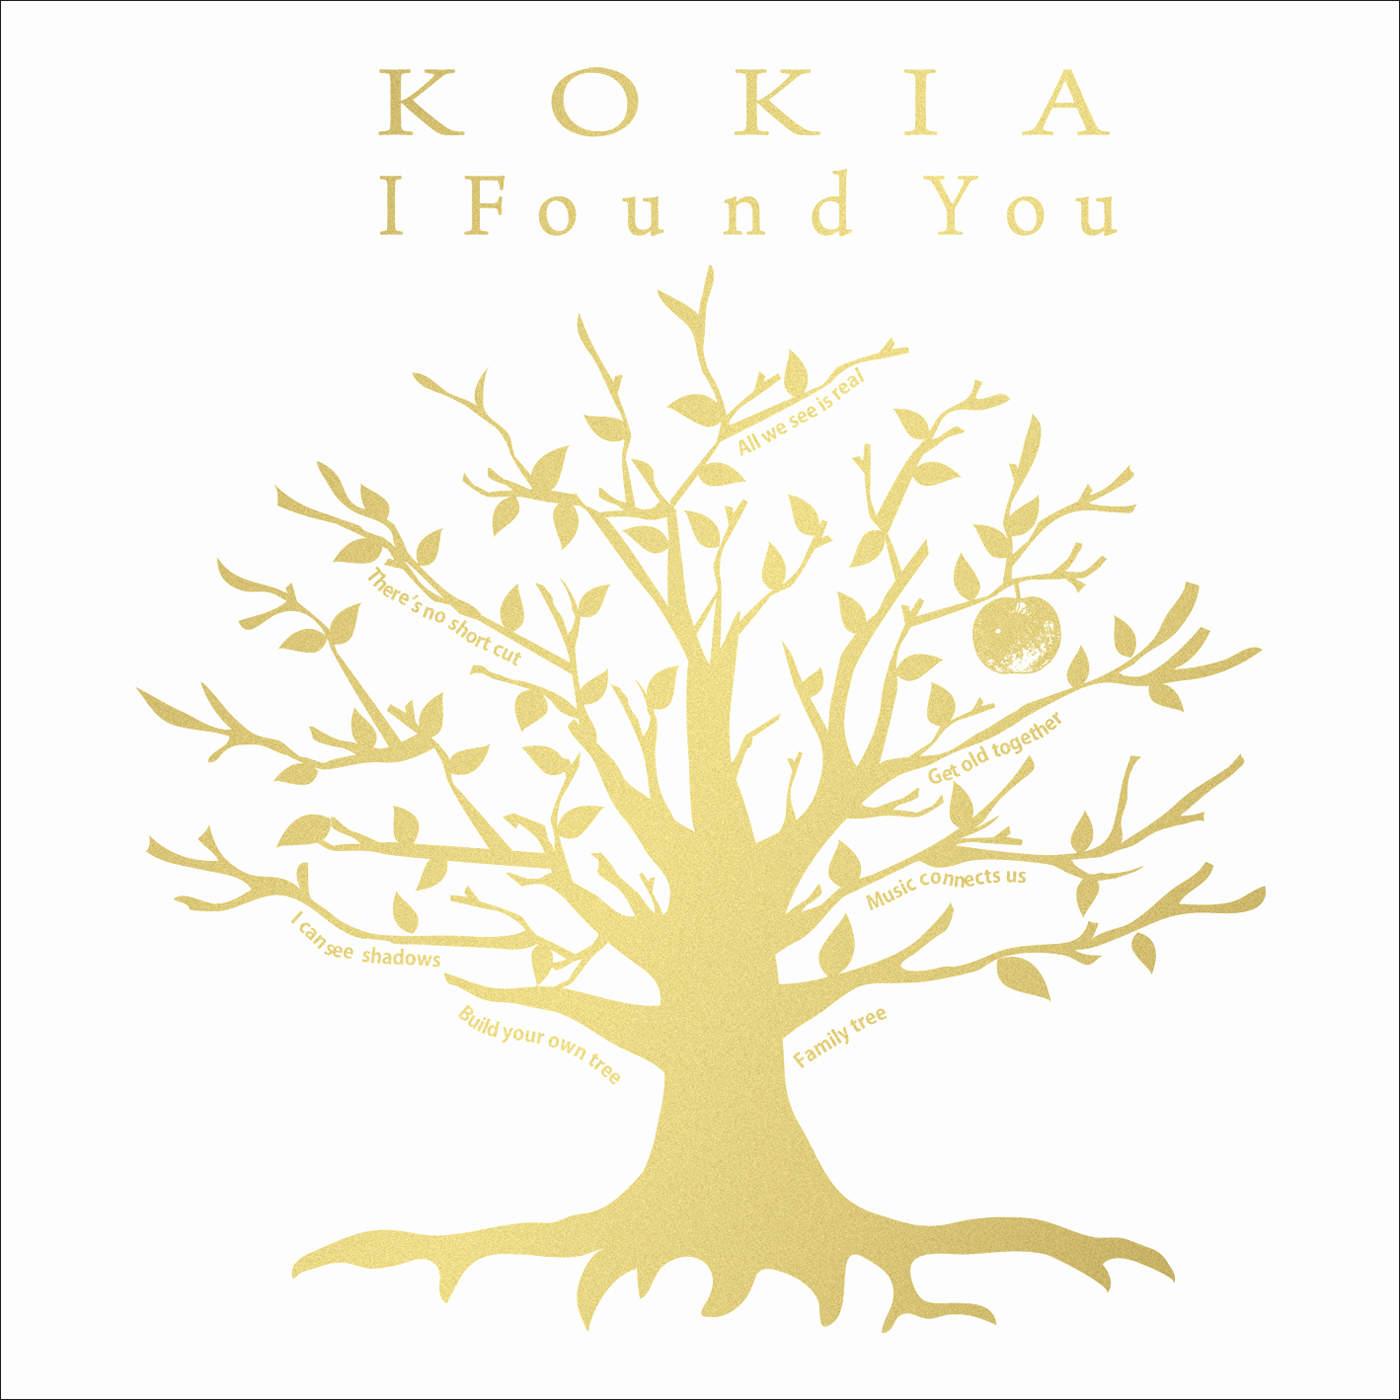 [Album] I Found You - KOKIA (mp3)